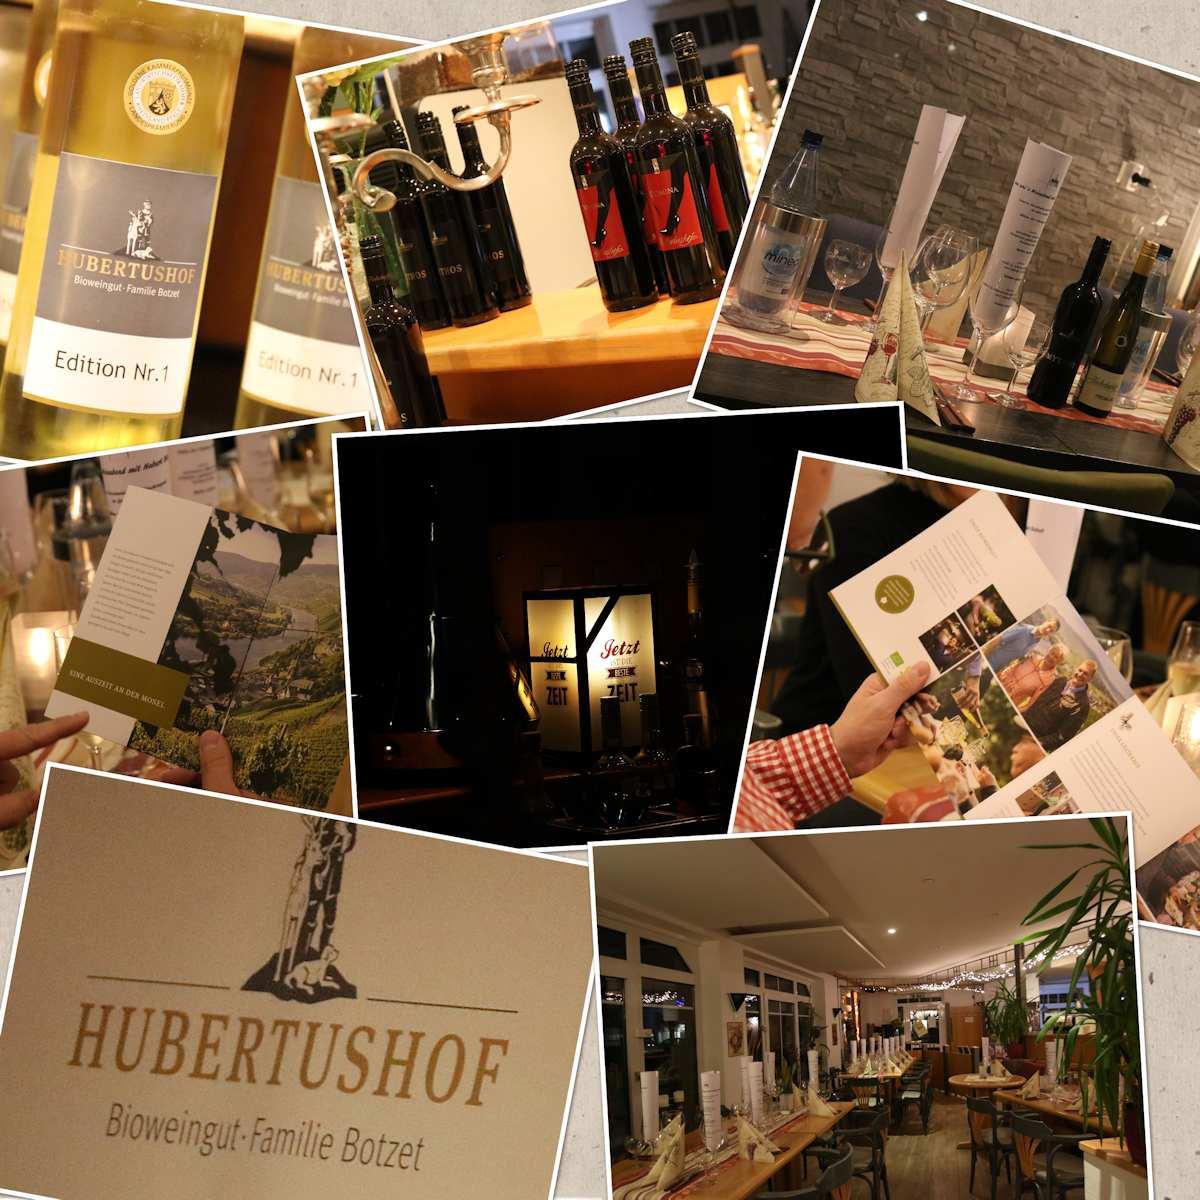 Weinabend, Weinprobe, Bioweingut Hubertushof, Botzet, Staatsehrenpreis